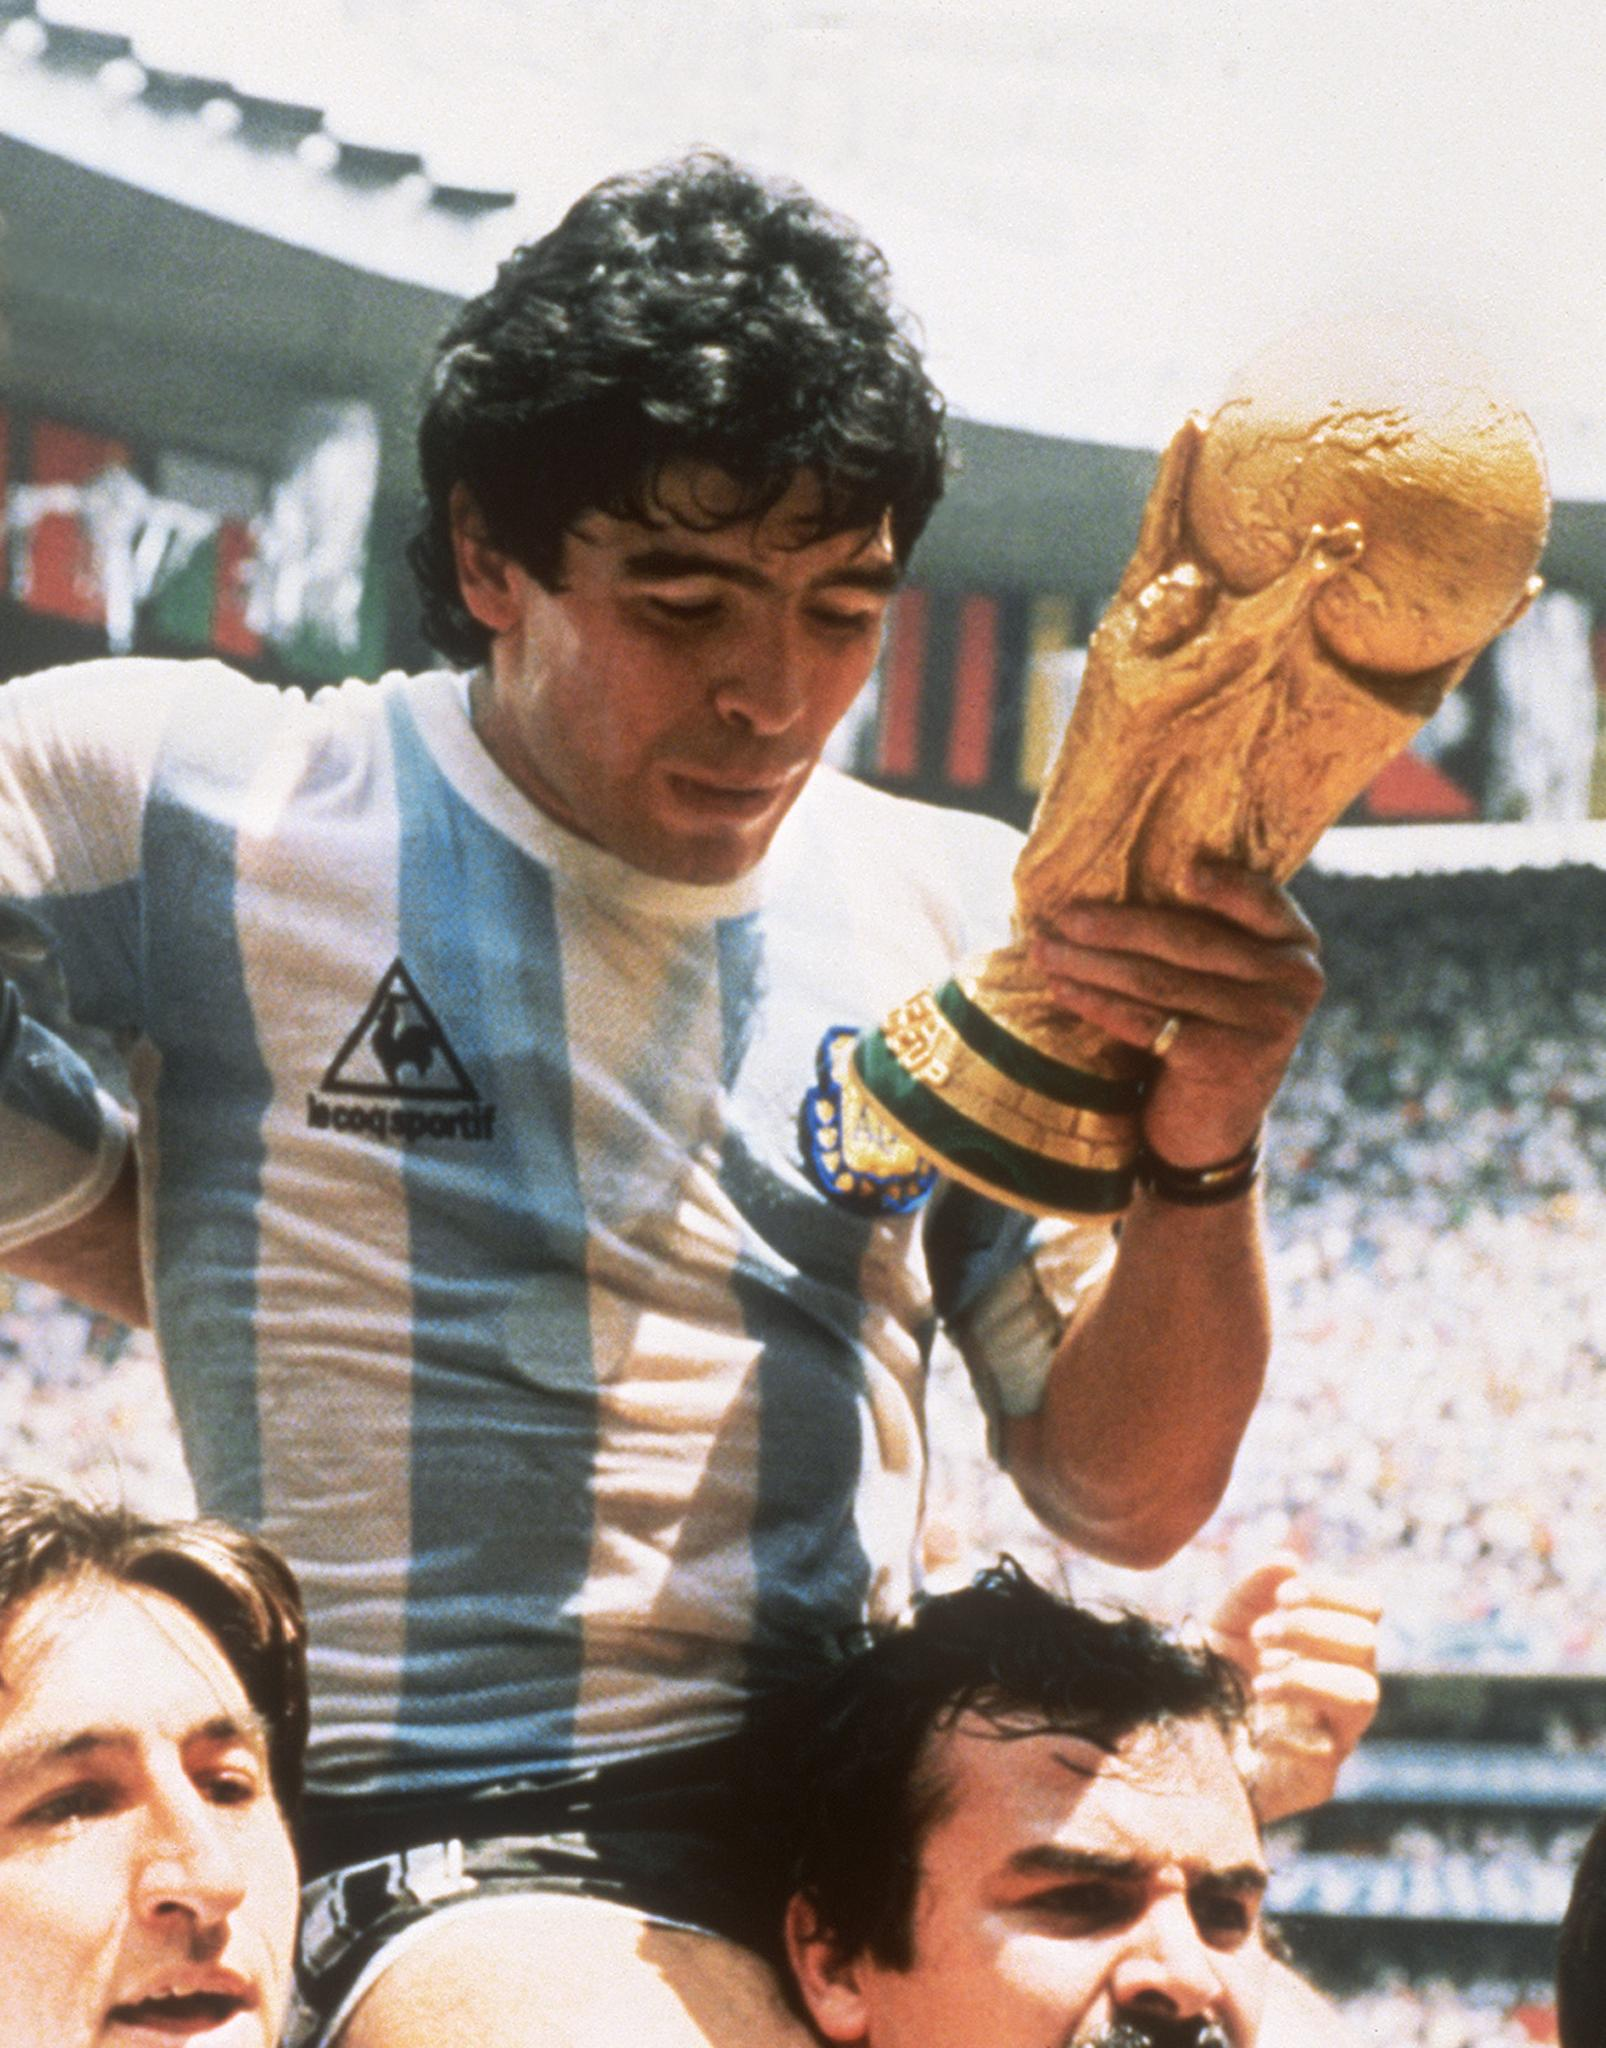 WORLD CUP-1986-ARG-MARADONA-FIFA CUP